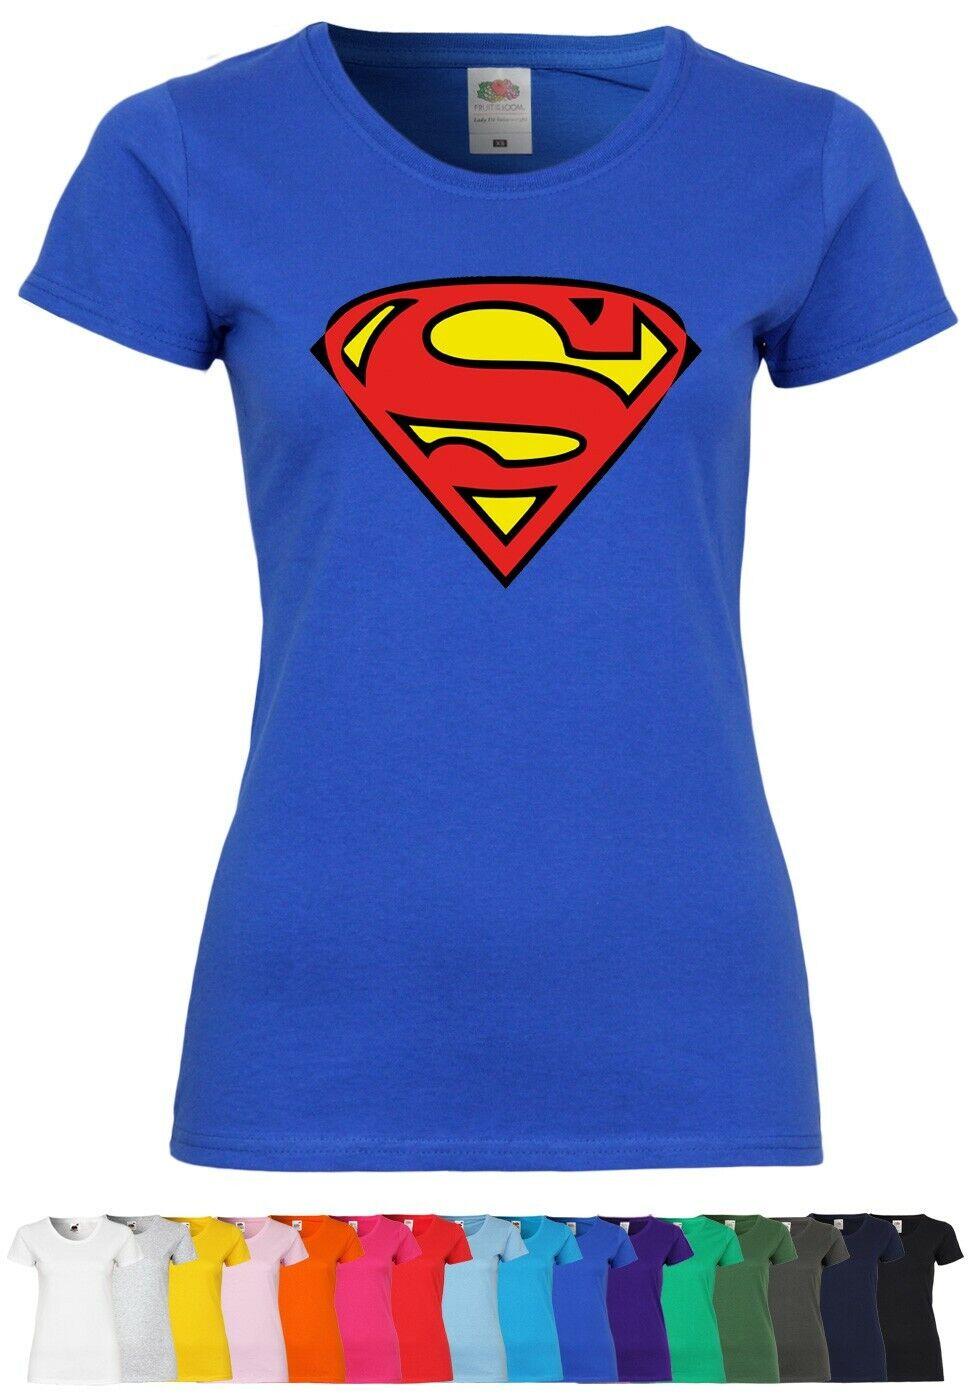 M91 F288N Damen T-Shirt mit Motiv Superman | Comic Superheld Fun Design Party